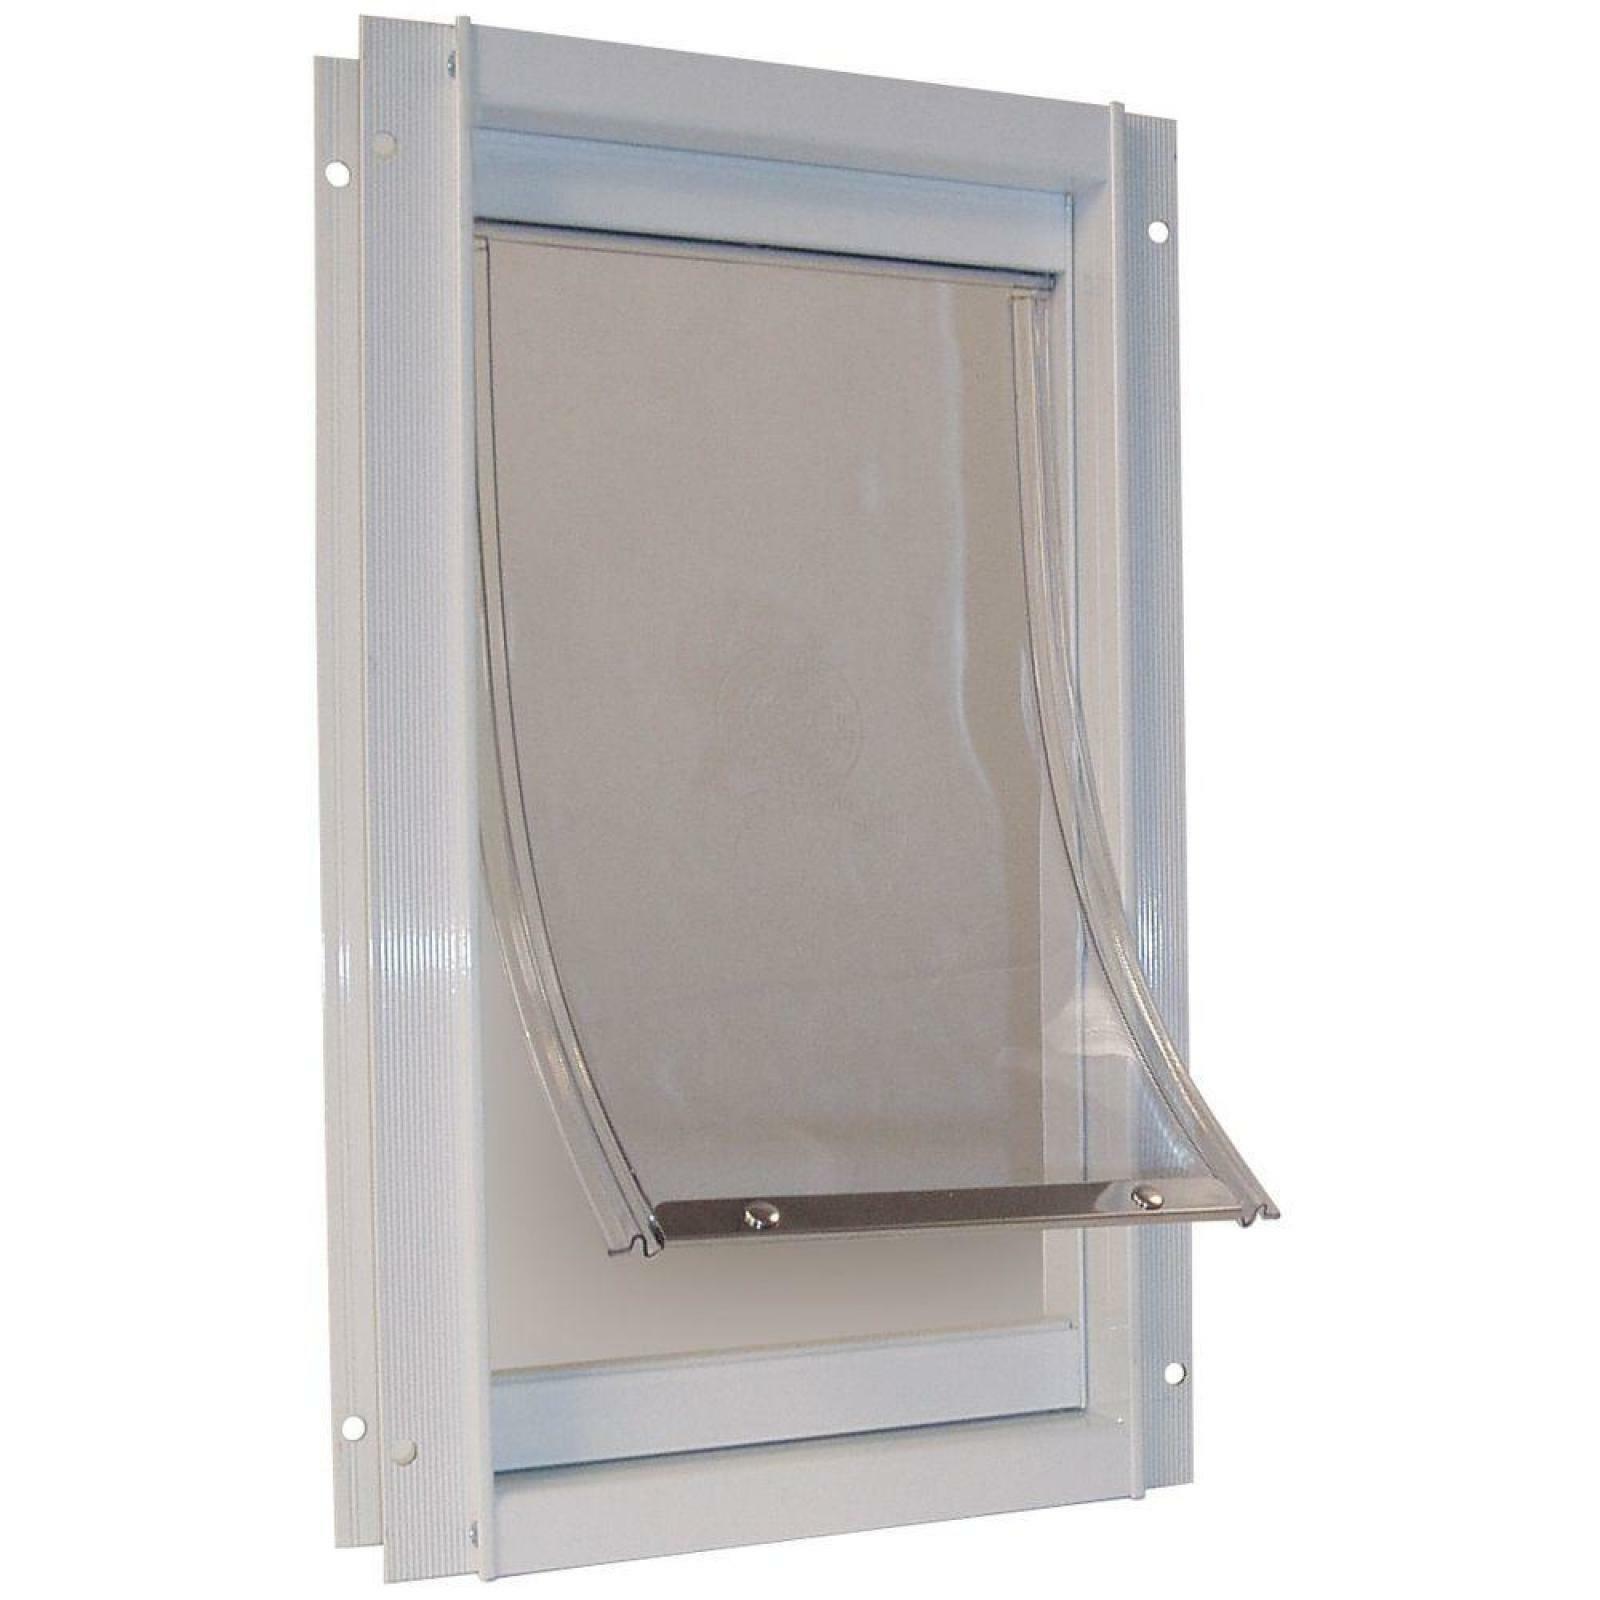 15  x 20 uper Large Deluxe Aluminum Frame Pet Door Ideal Flap Dog Lockable